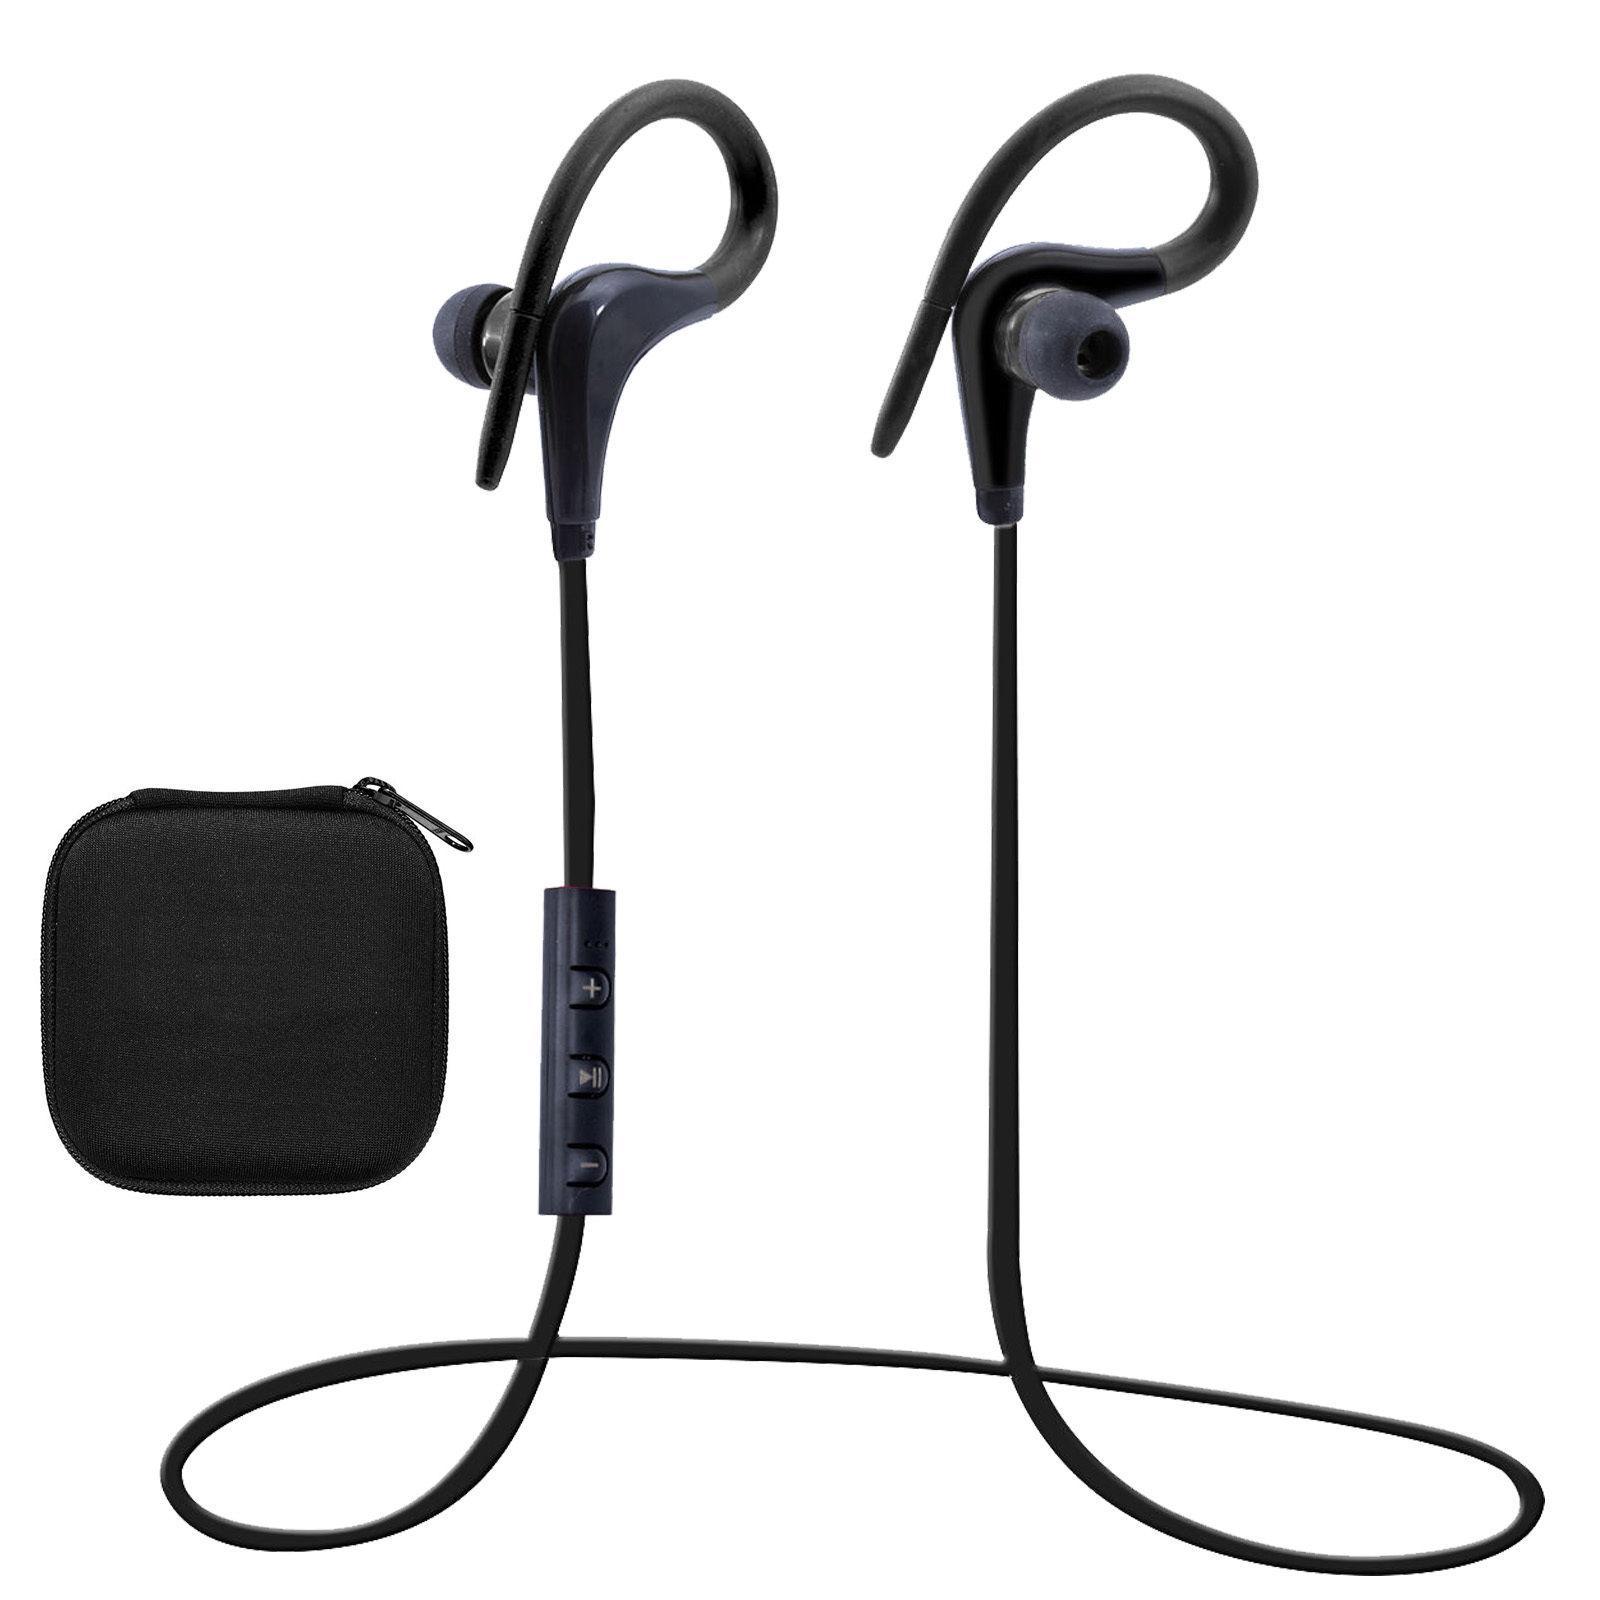 Wireless Bluetooth Headset Sport Stereo Headphone Earphone For Phone Samsung Lg Cell Phone Head Set Earphones For Cell Phones From Kytech2016 6 94 Dhgate Com